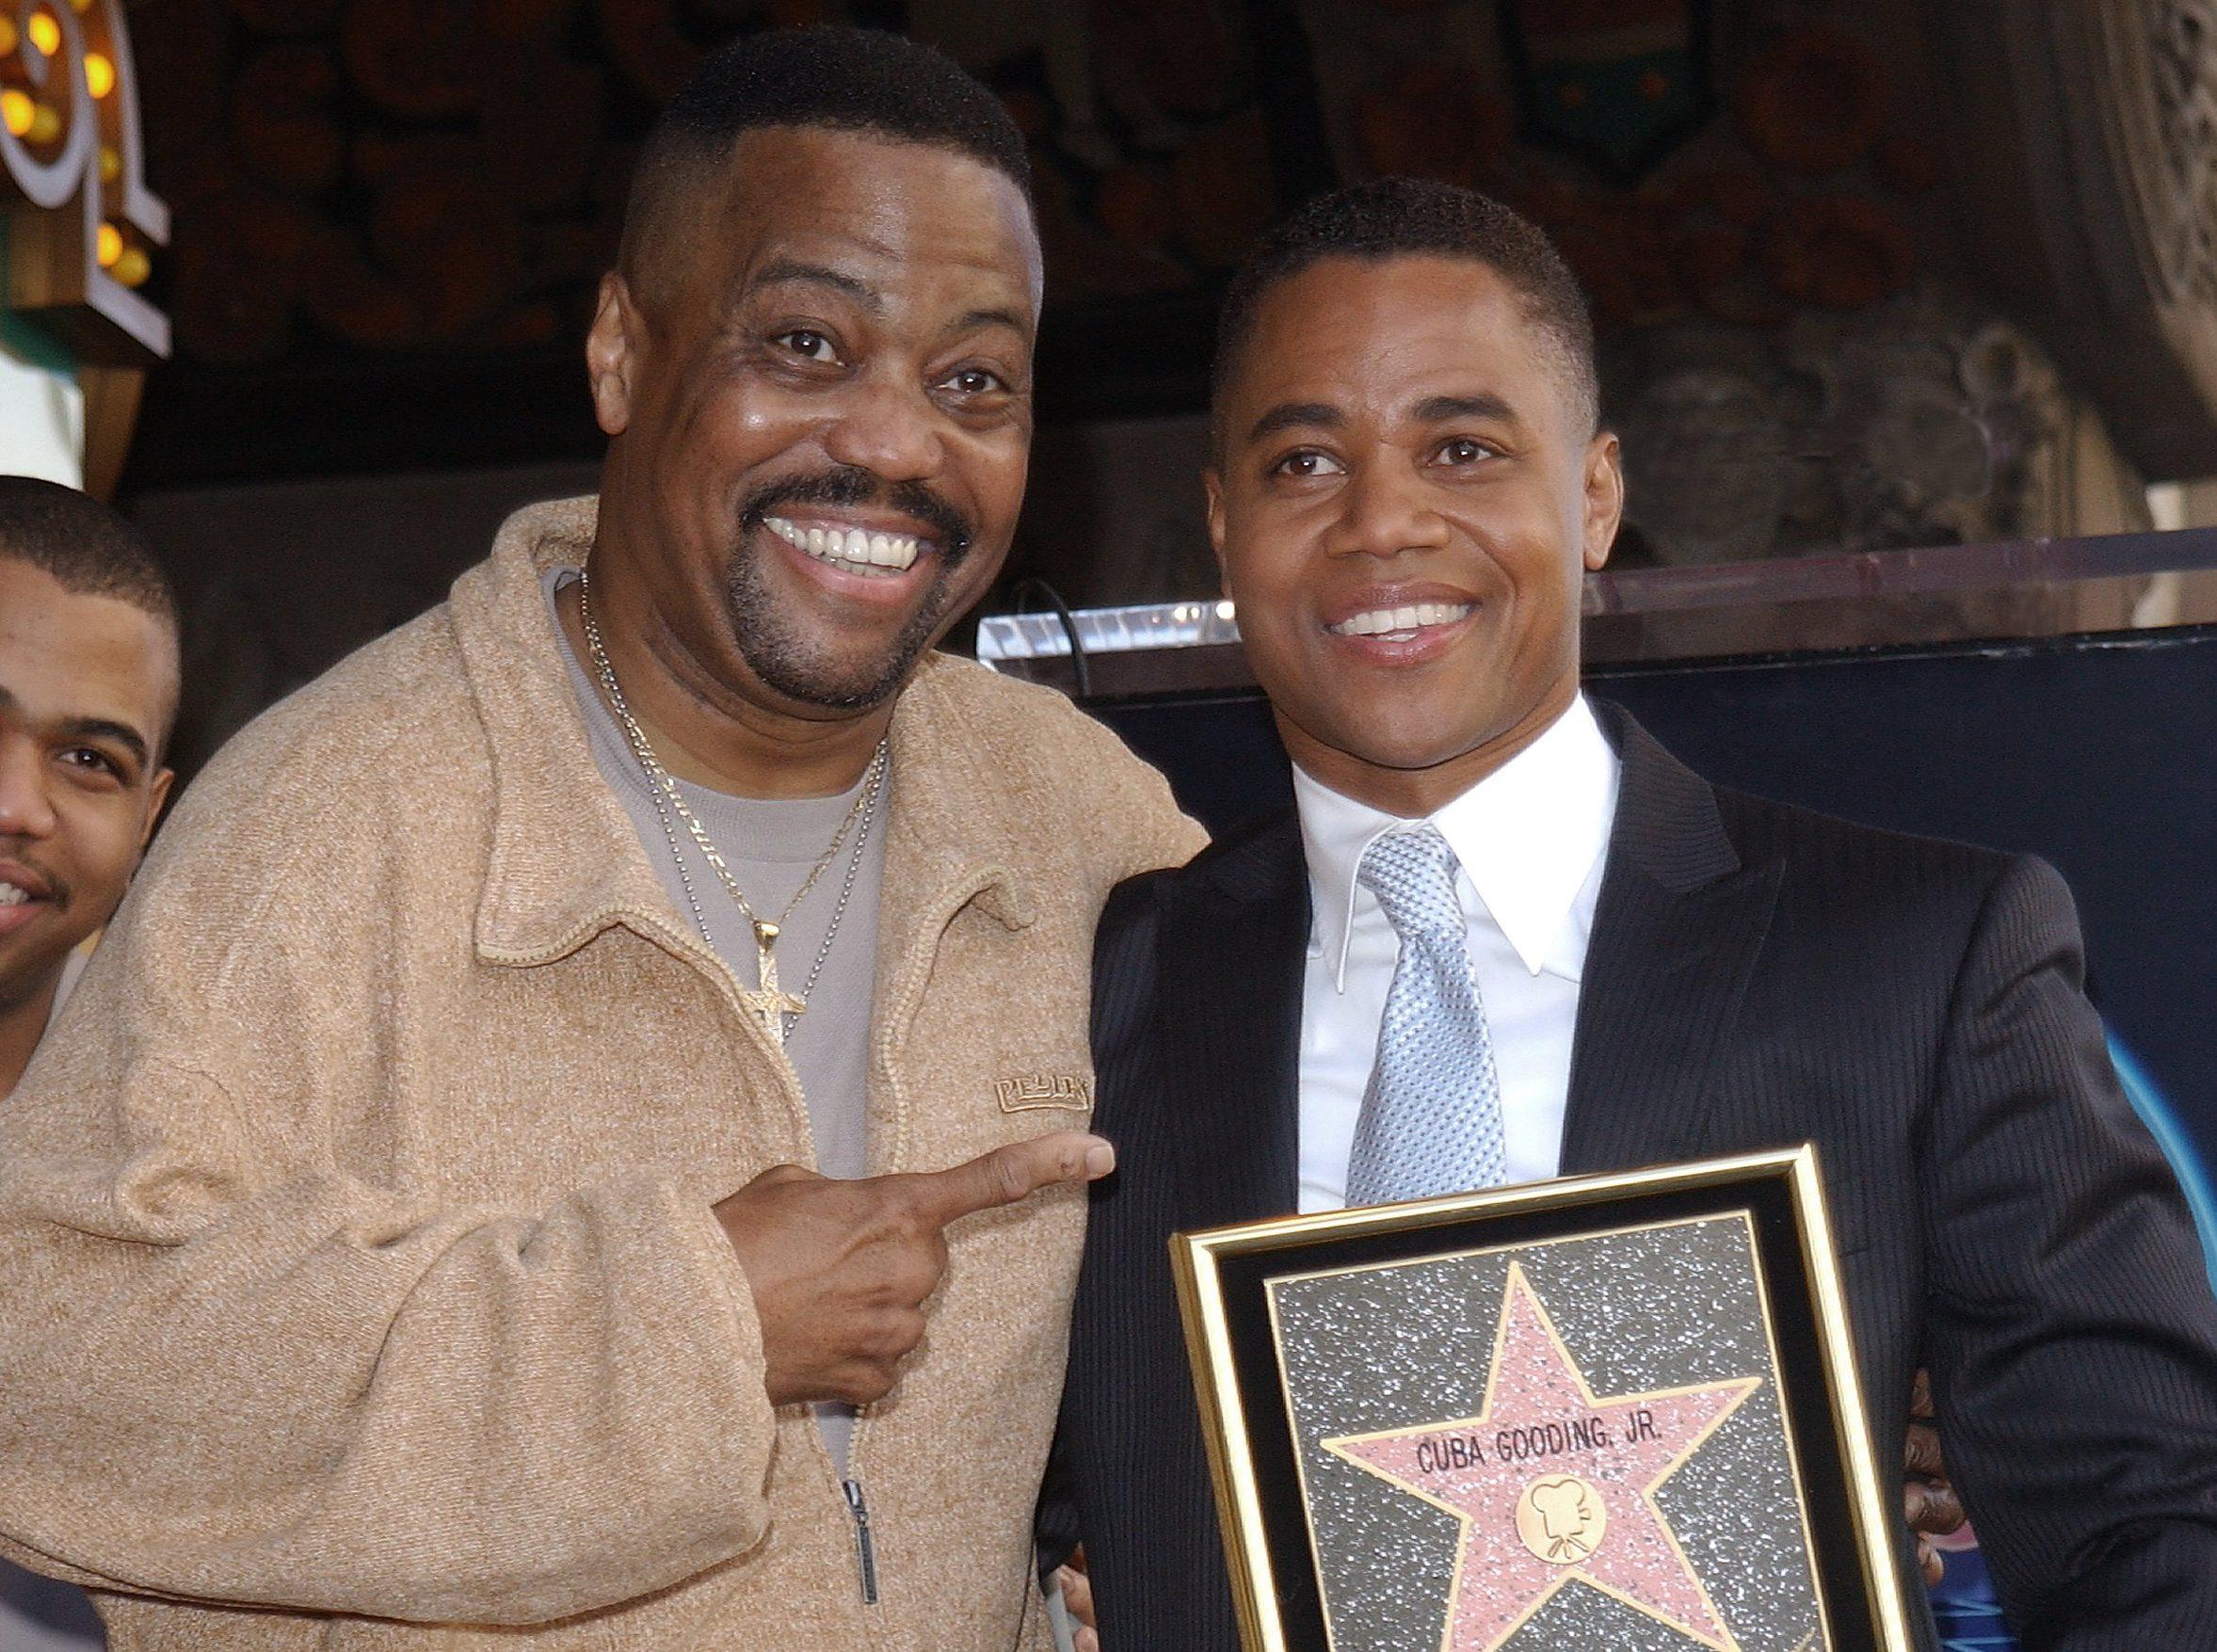 Cuba Gooding Jr. Gets Hollywood Star